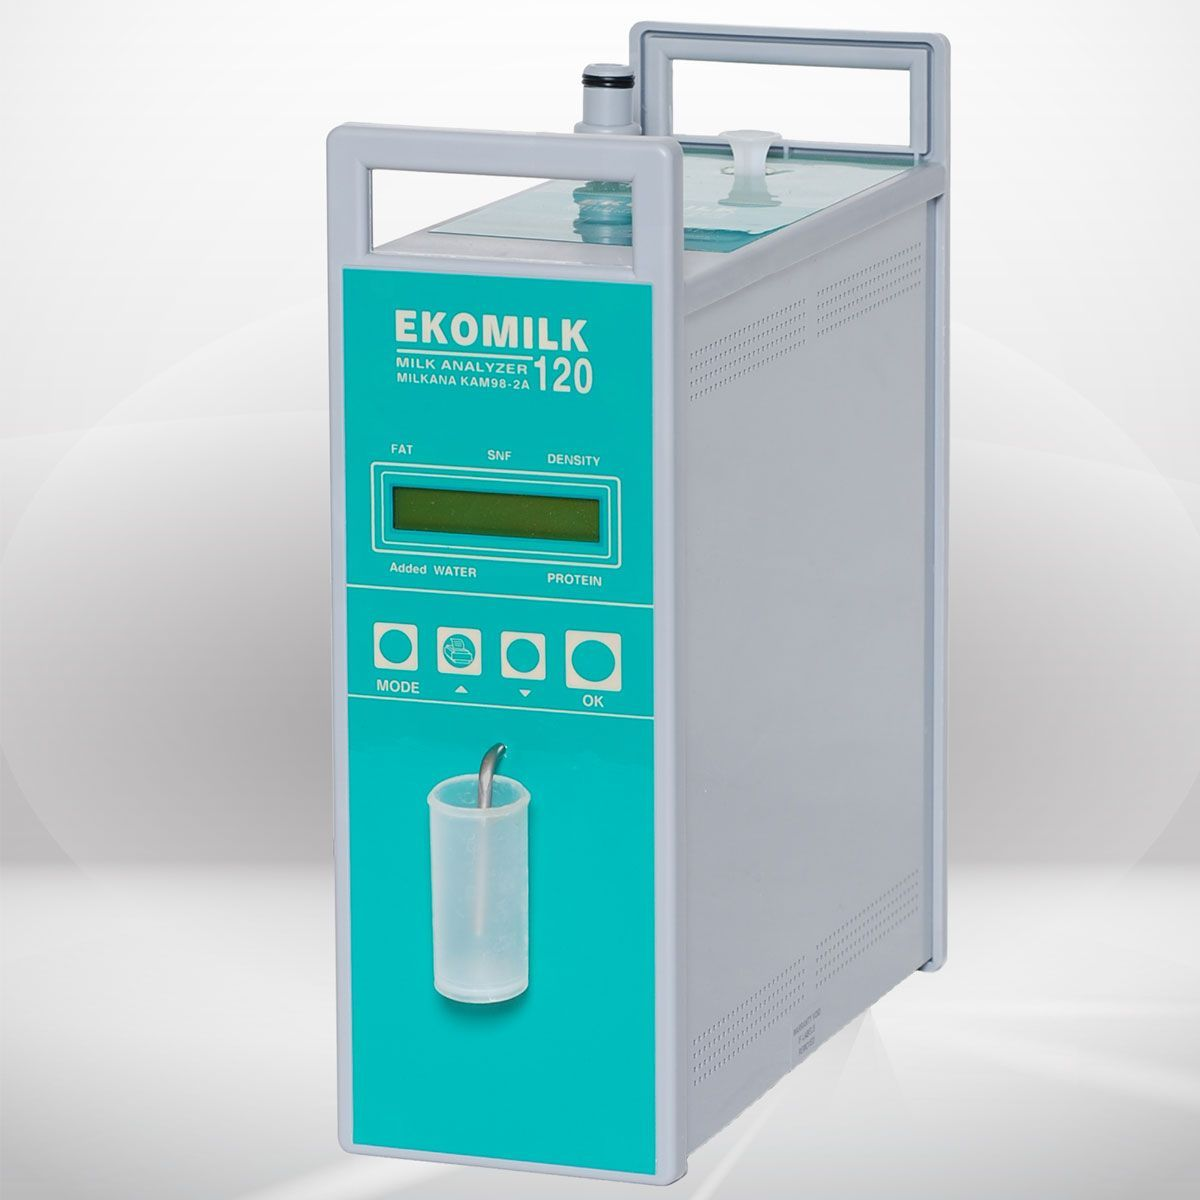 Máy phân tích sữa 120 giây, model: Ekomilk 120